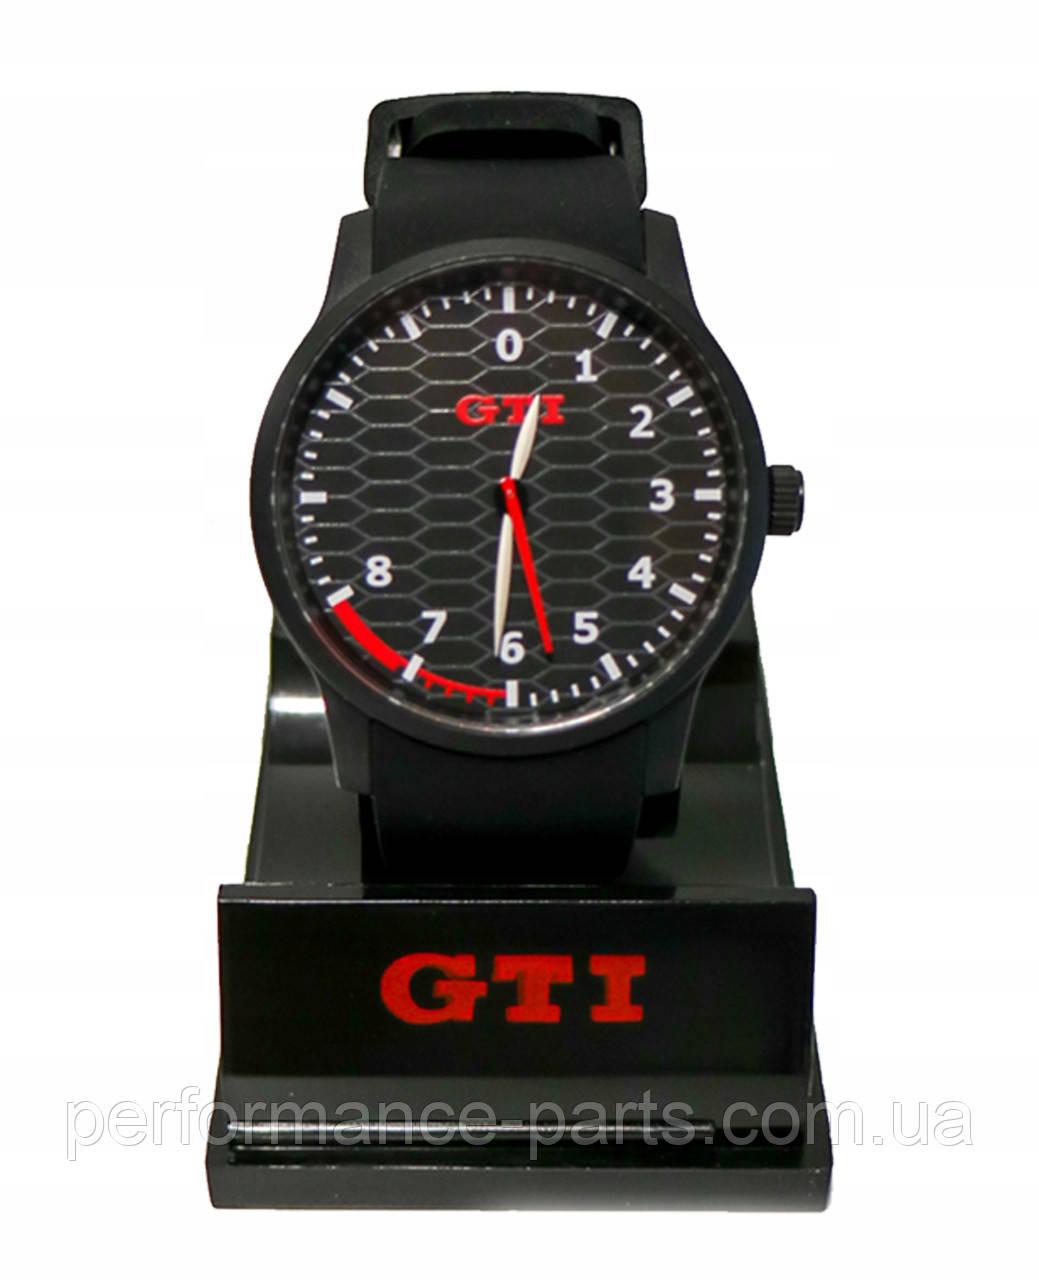 Наручные часы унисекс Volkswagen GTI Watch, Unisex, Black 5ka050830